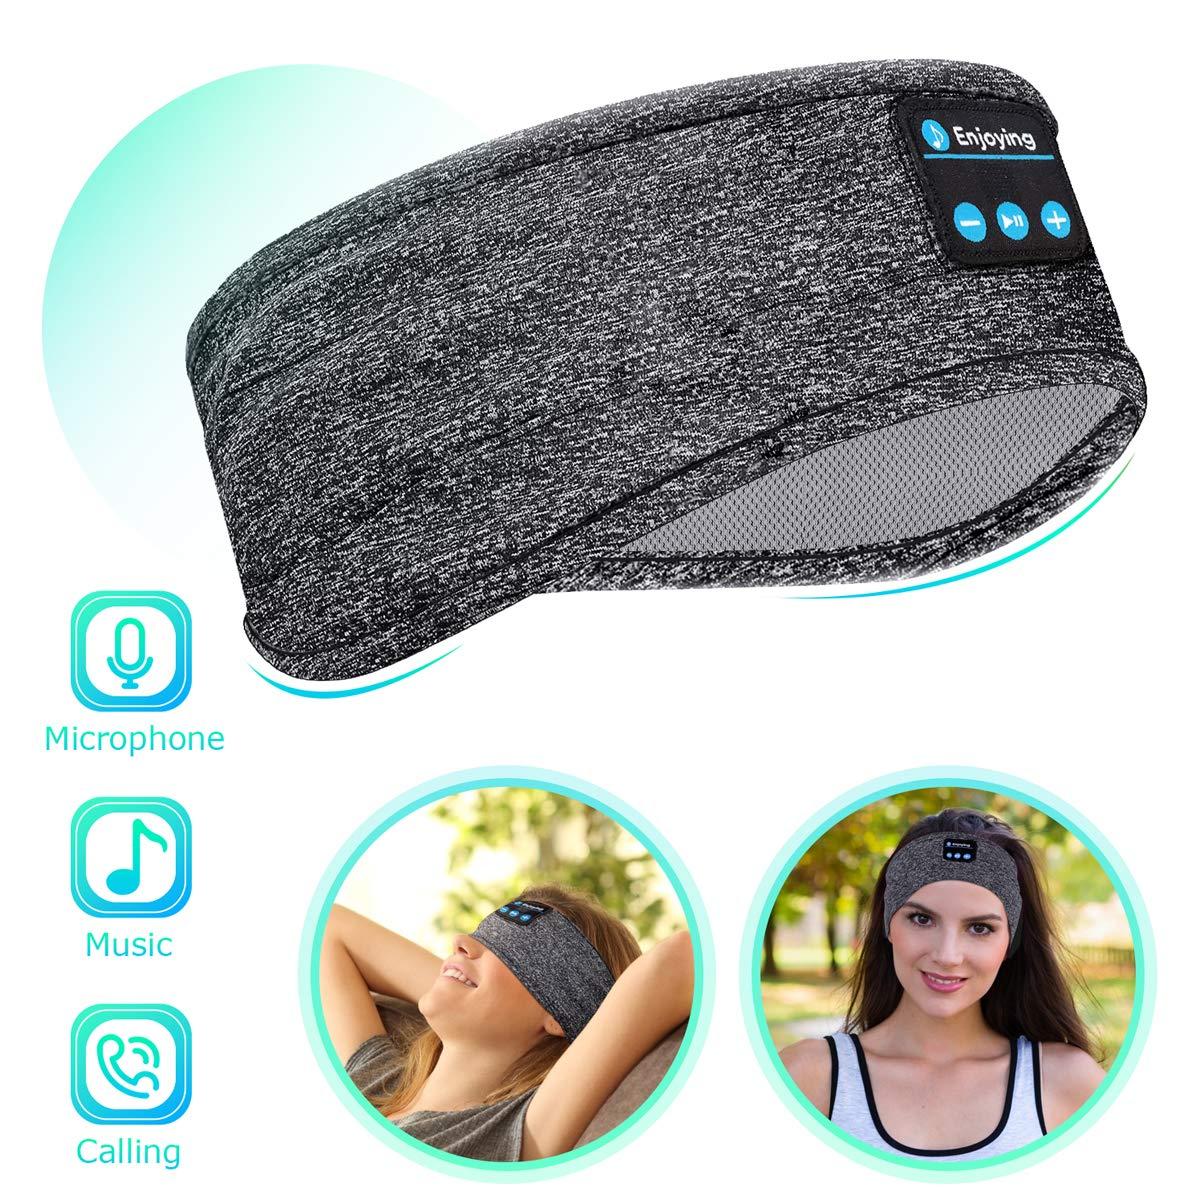 Bluetooth Sleep Headphones Eye Mask, Wireless Sports Headband Headphones with Detachable Stereo Thin Speaker for Sleeping, Sports, Meditation & Relax, Sports Headband (Grey)